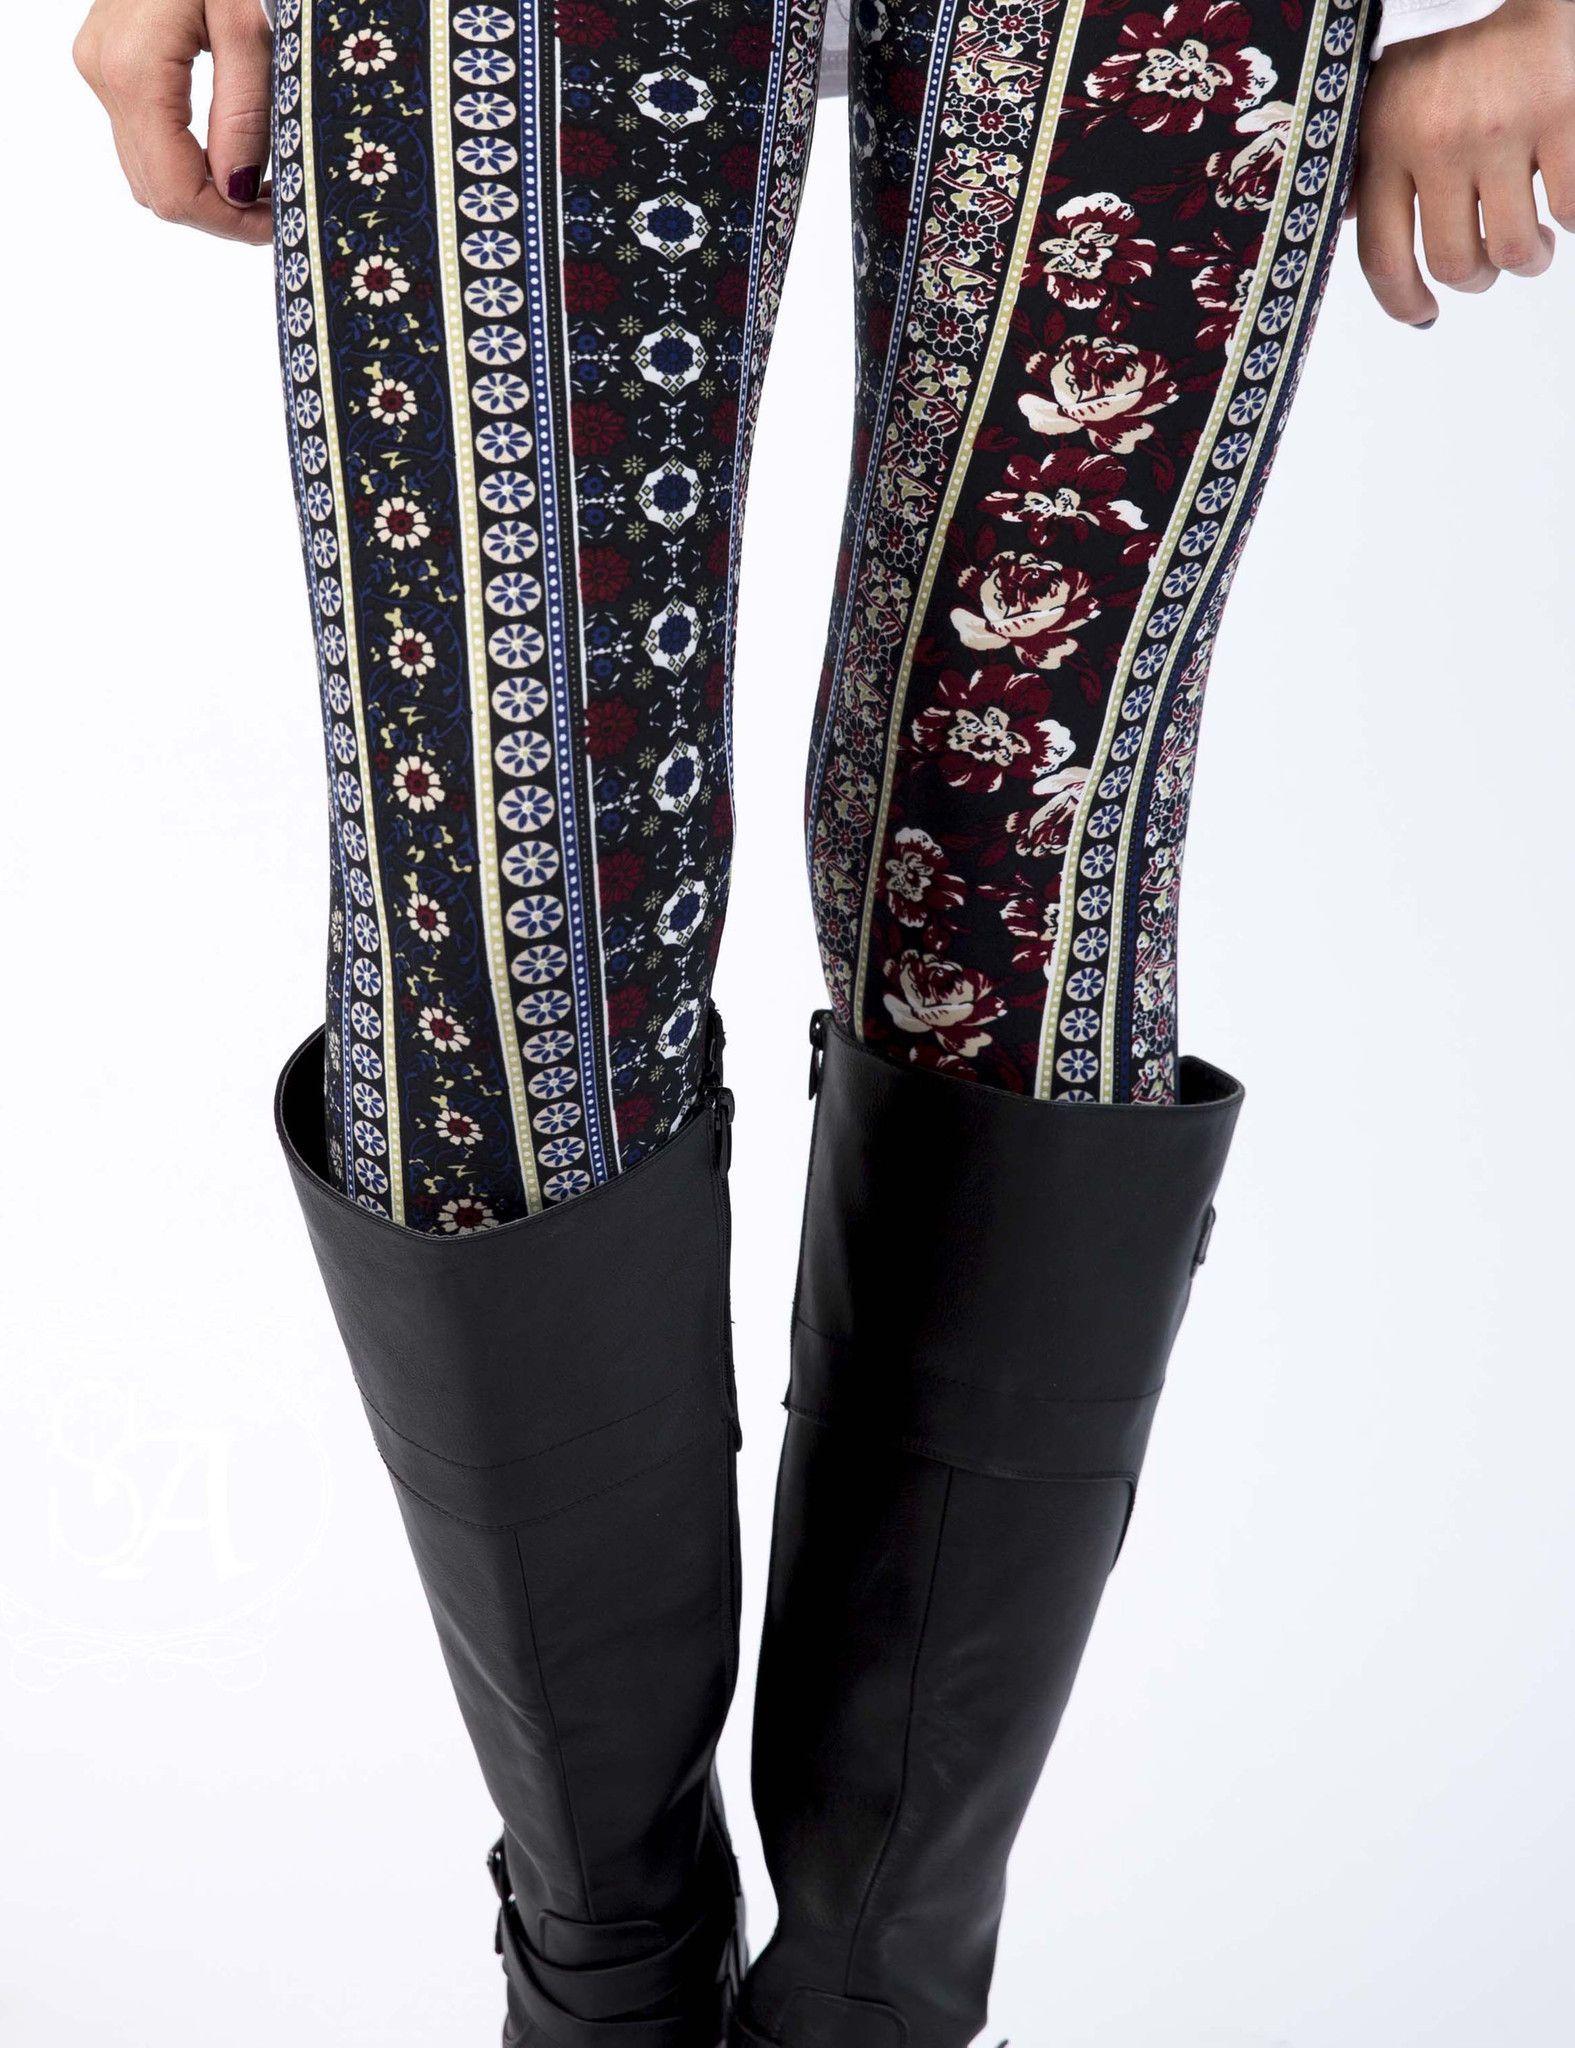 #boutiquedeals Floral Patterned Leggings